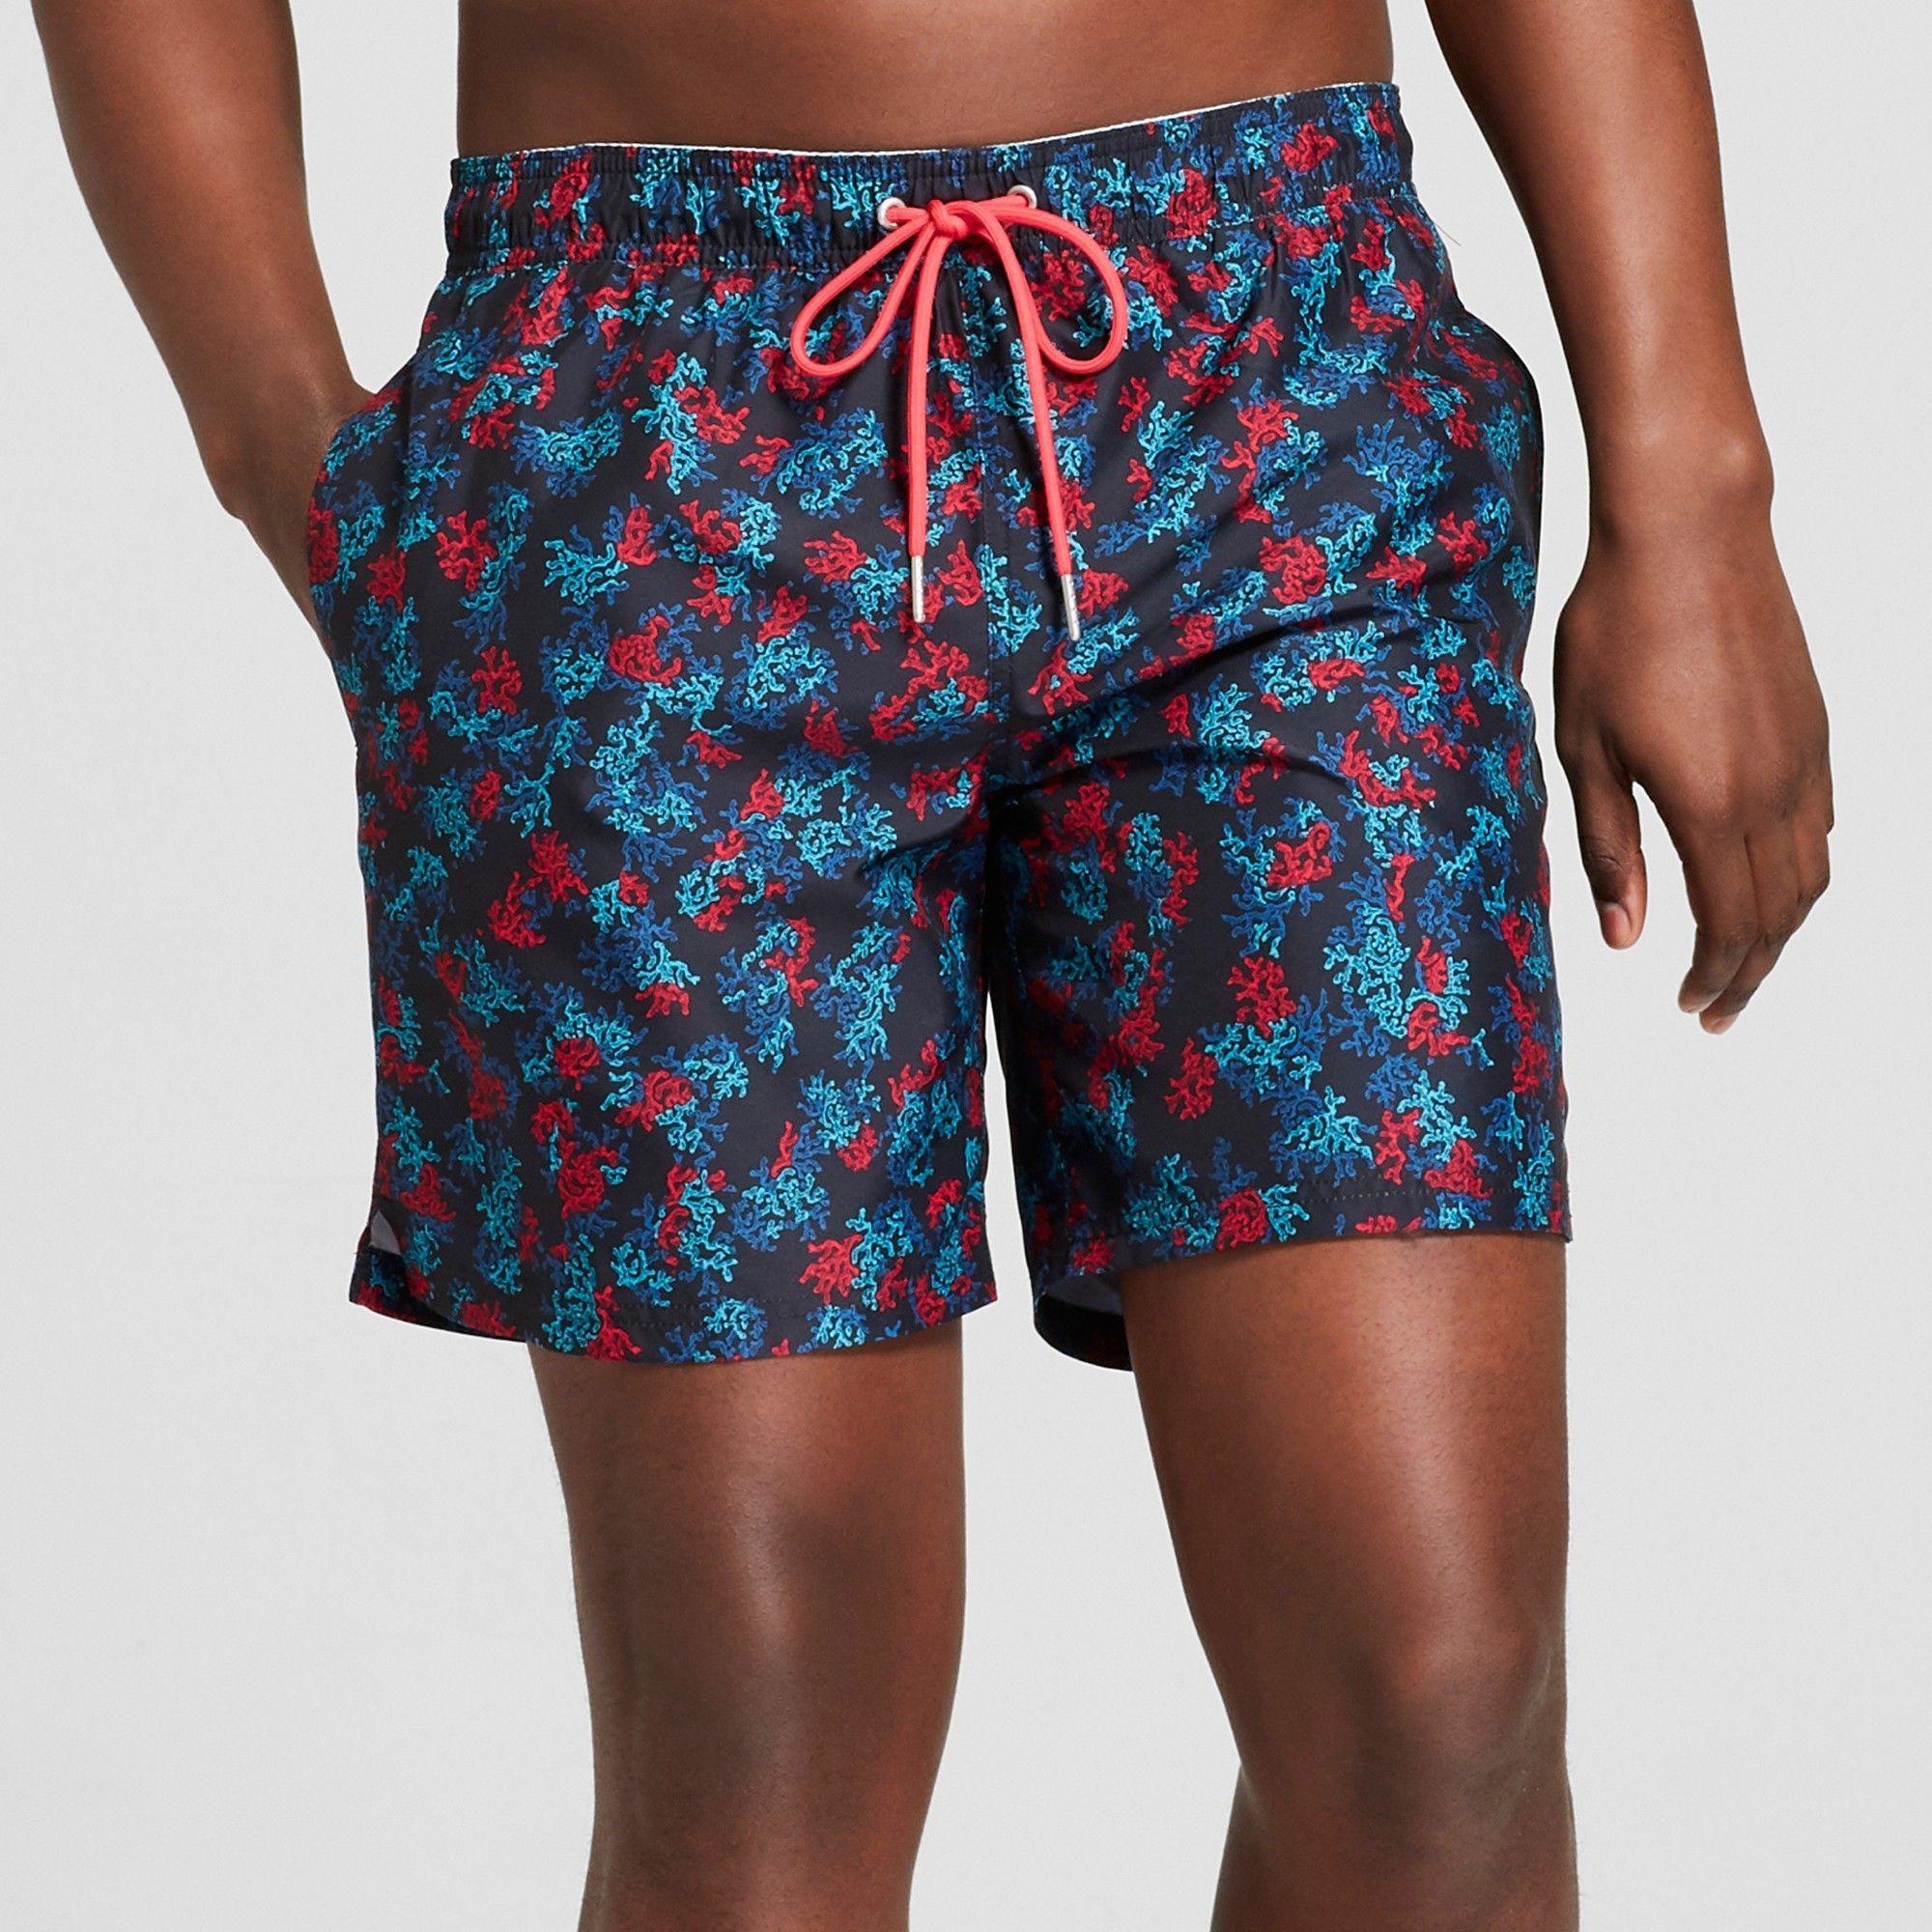 e143336421 Men's 7 Tropical Floral Print Swim Trunks - Goodfellow & Co Black M ...